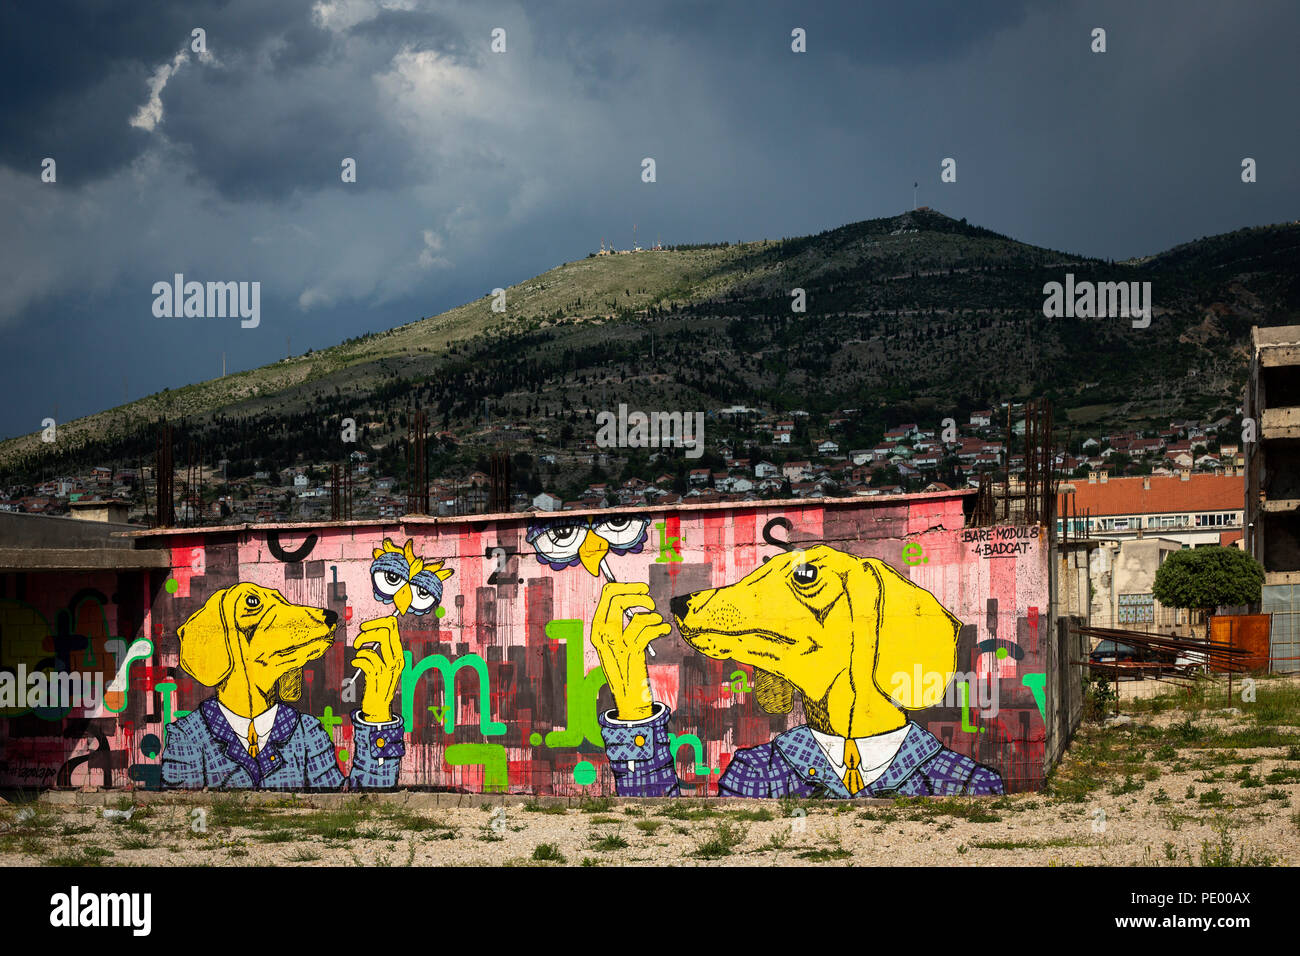 A graffiti showing two anthropomorphous dogs on a disused wall of Mostar downtown ( (Herzegovina-Neretva, Bosnia-Herzegovina). Stock Photo